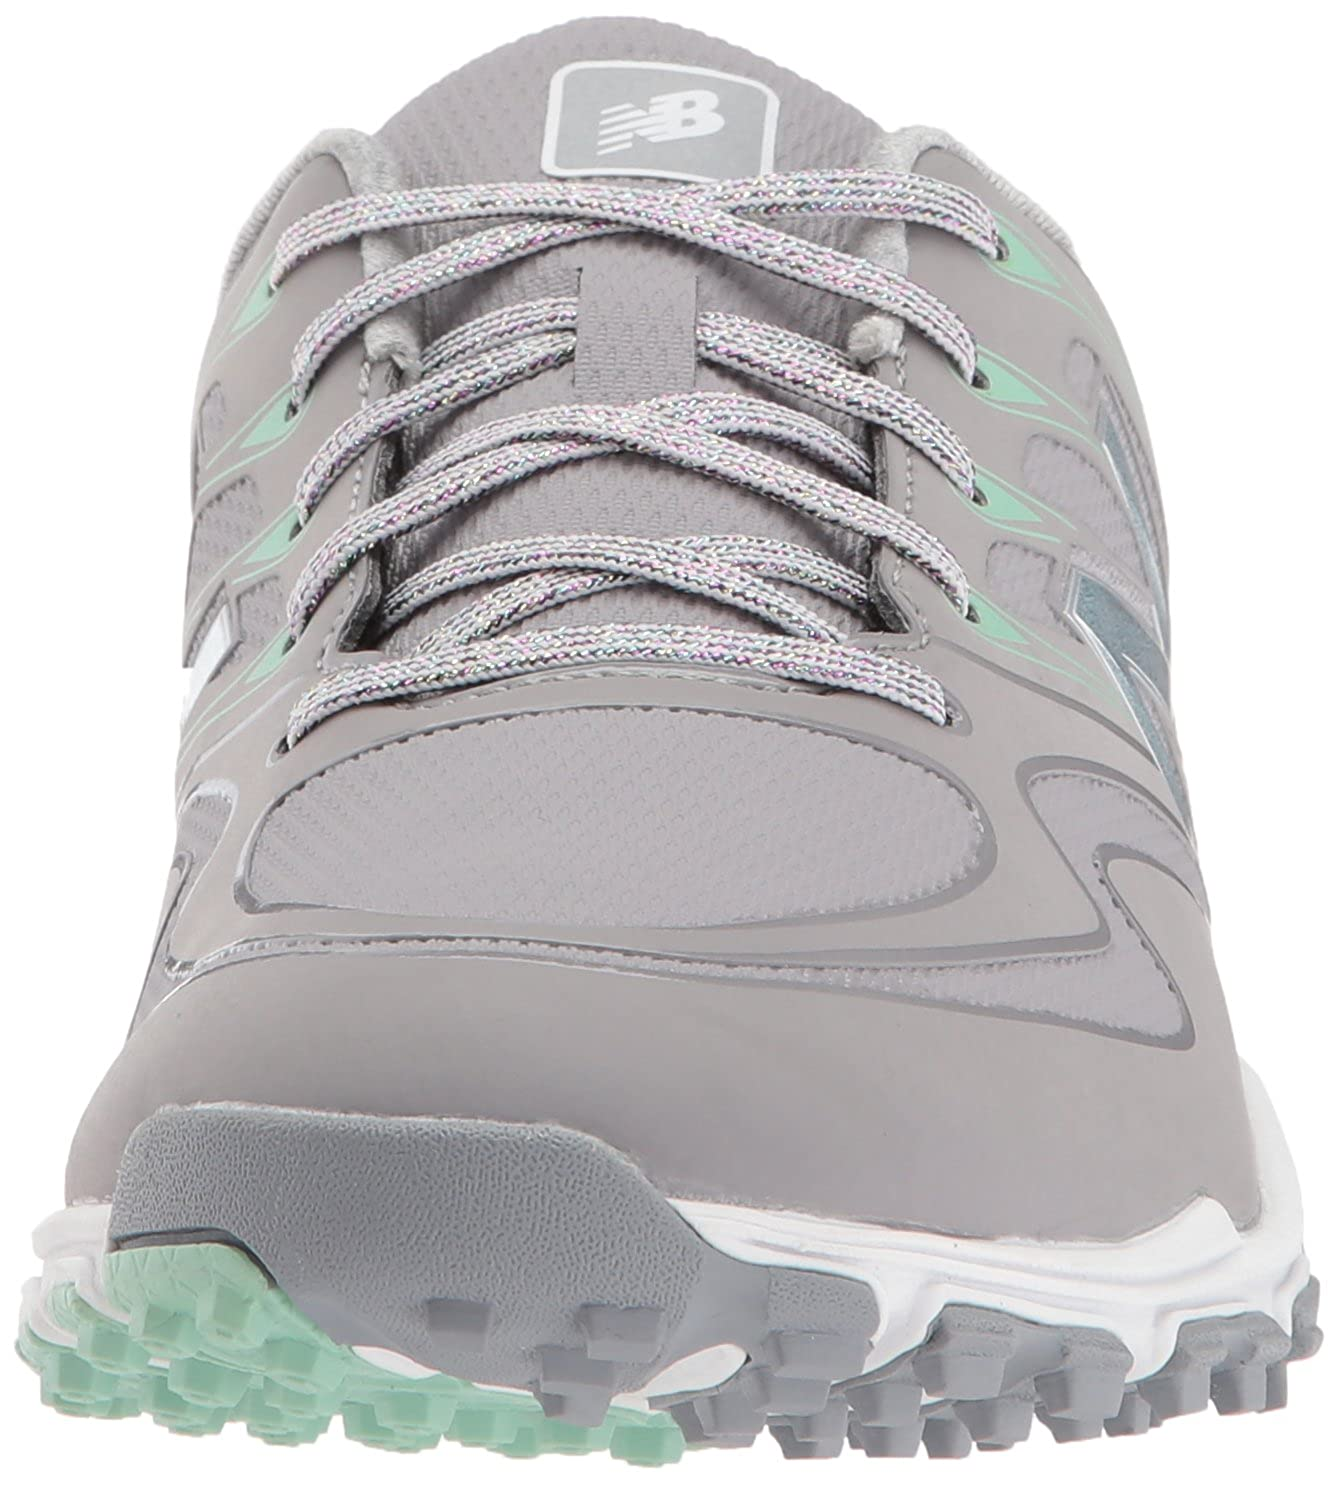 New Balance Frauen Flache Sandalen Grey/Mint